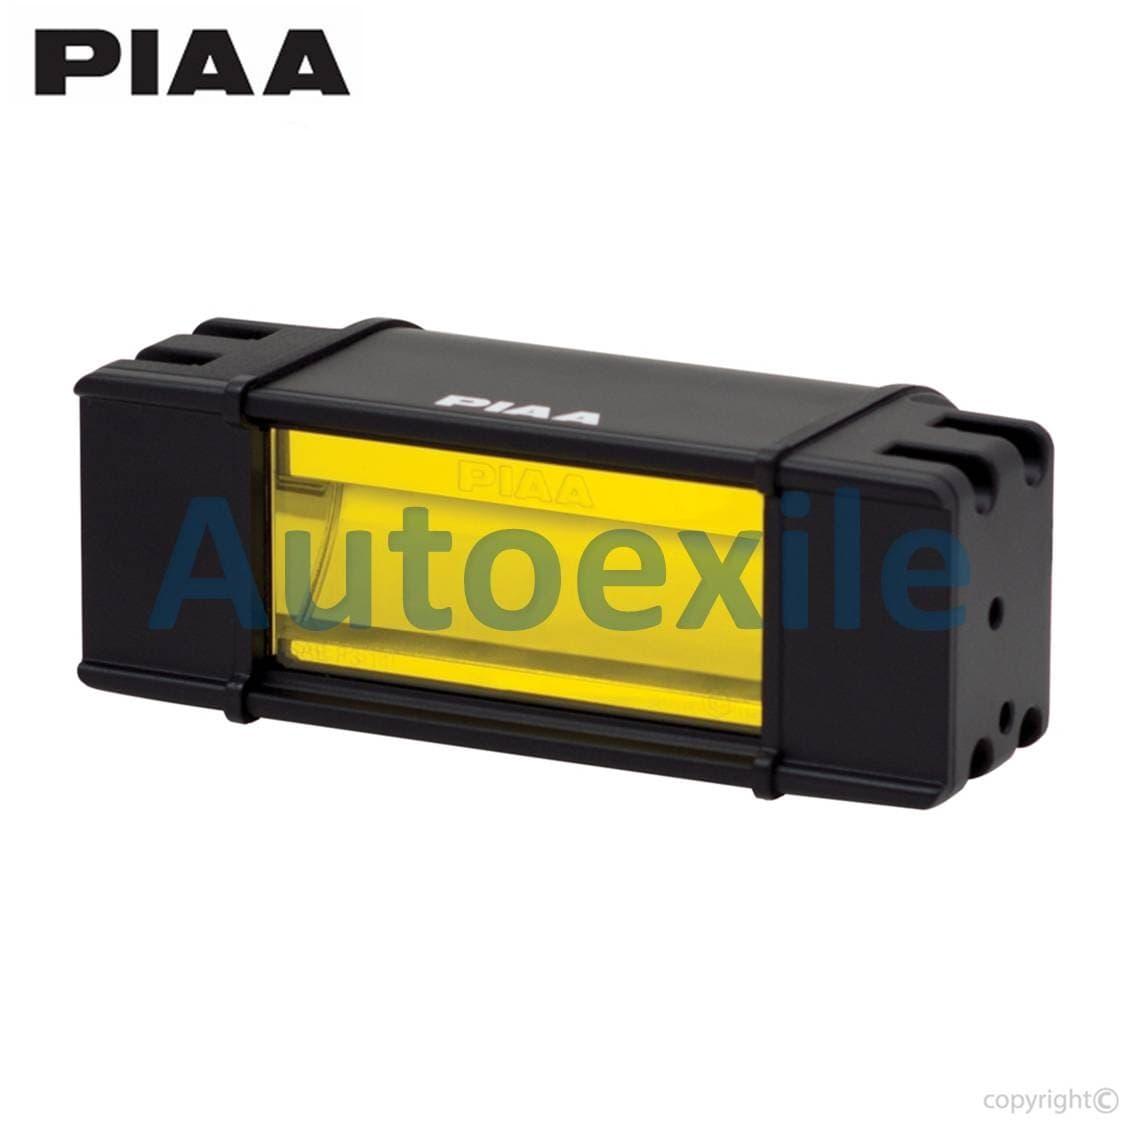 Harga Lampu Led Fog Lamp Mobil Termurah Light H3 T10 Smd 5630 2pcs Piaa Dkrf68x Ion Yellow 6 Kit 2500k Sorot Kuning Off Road